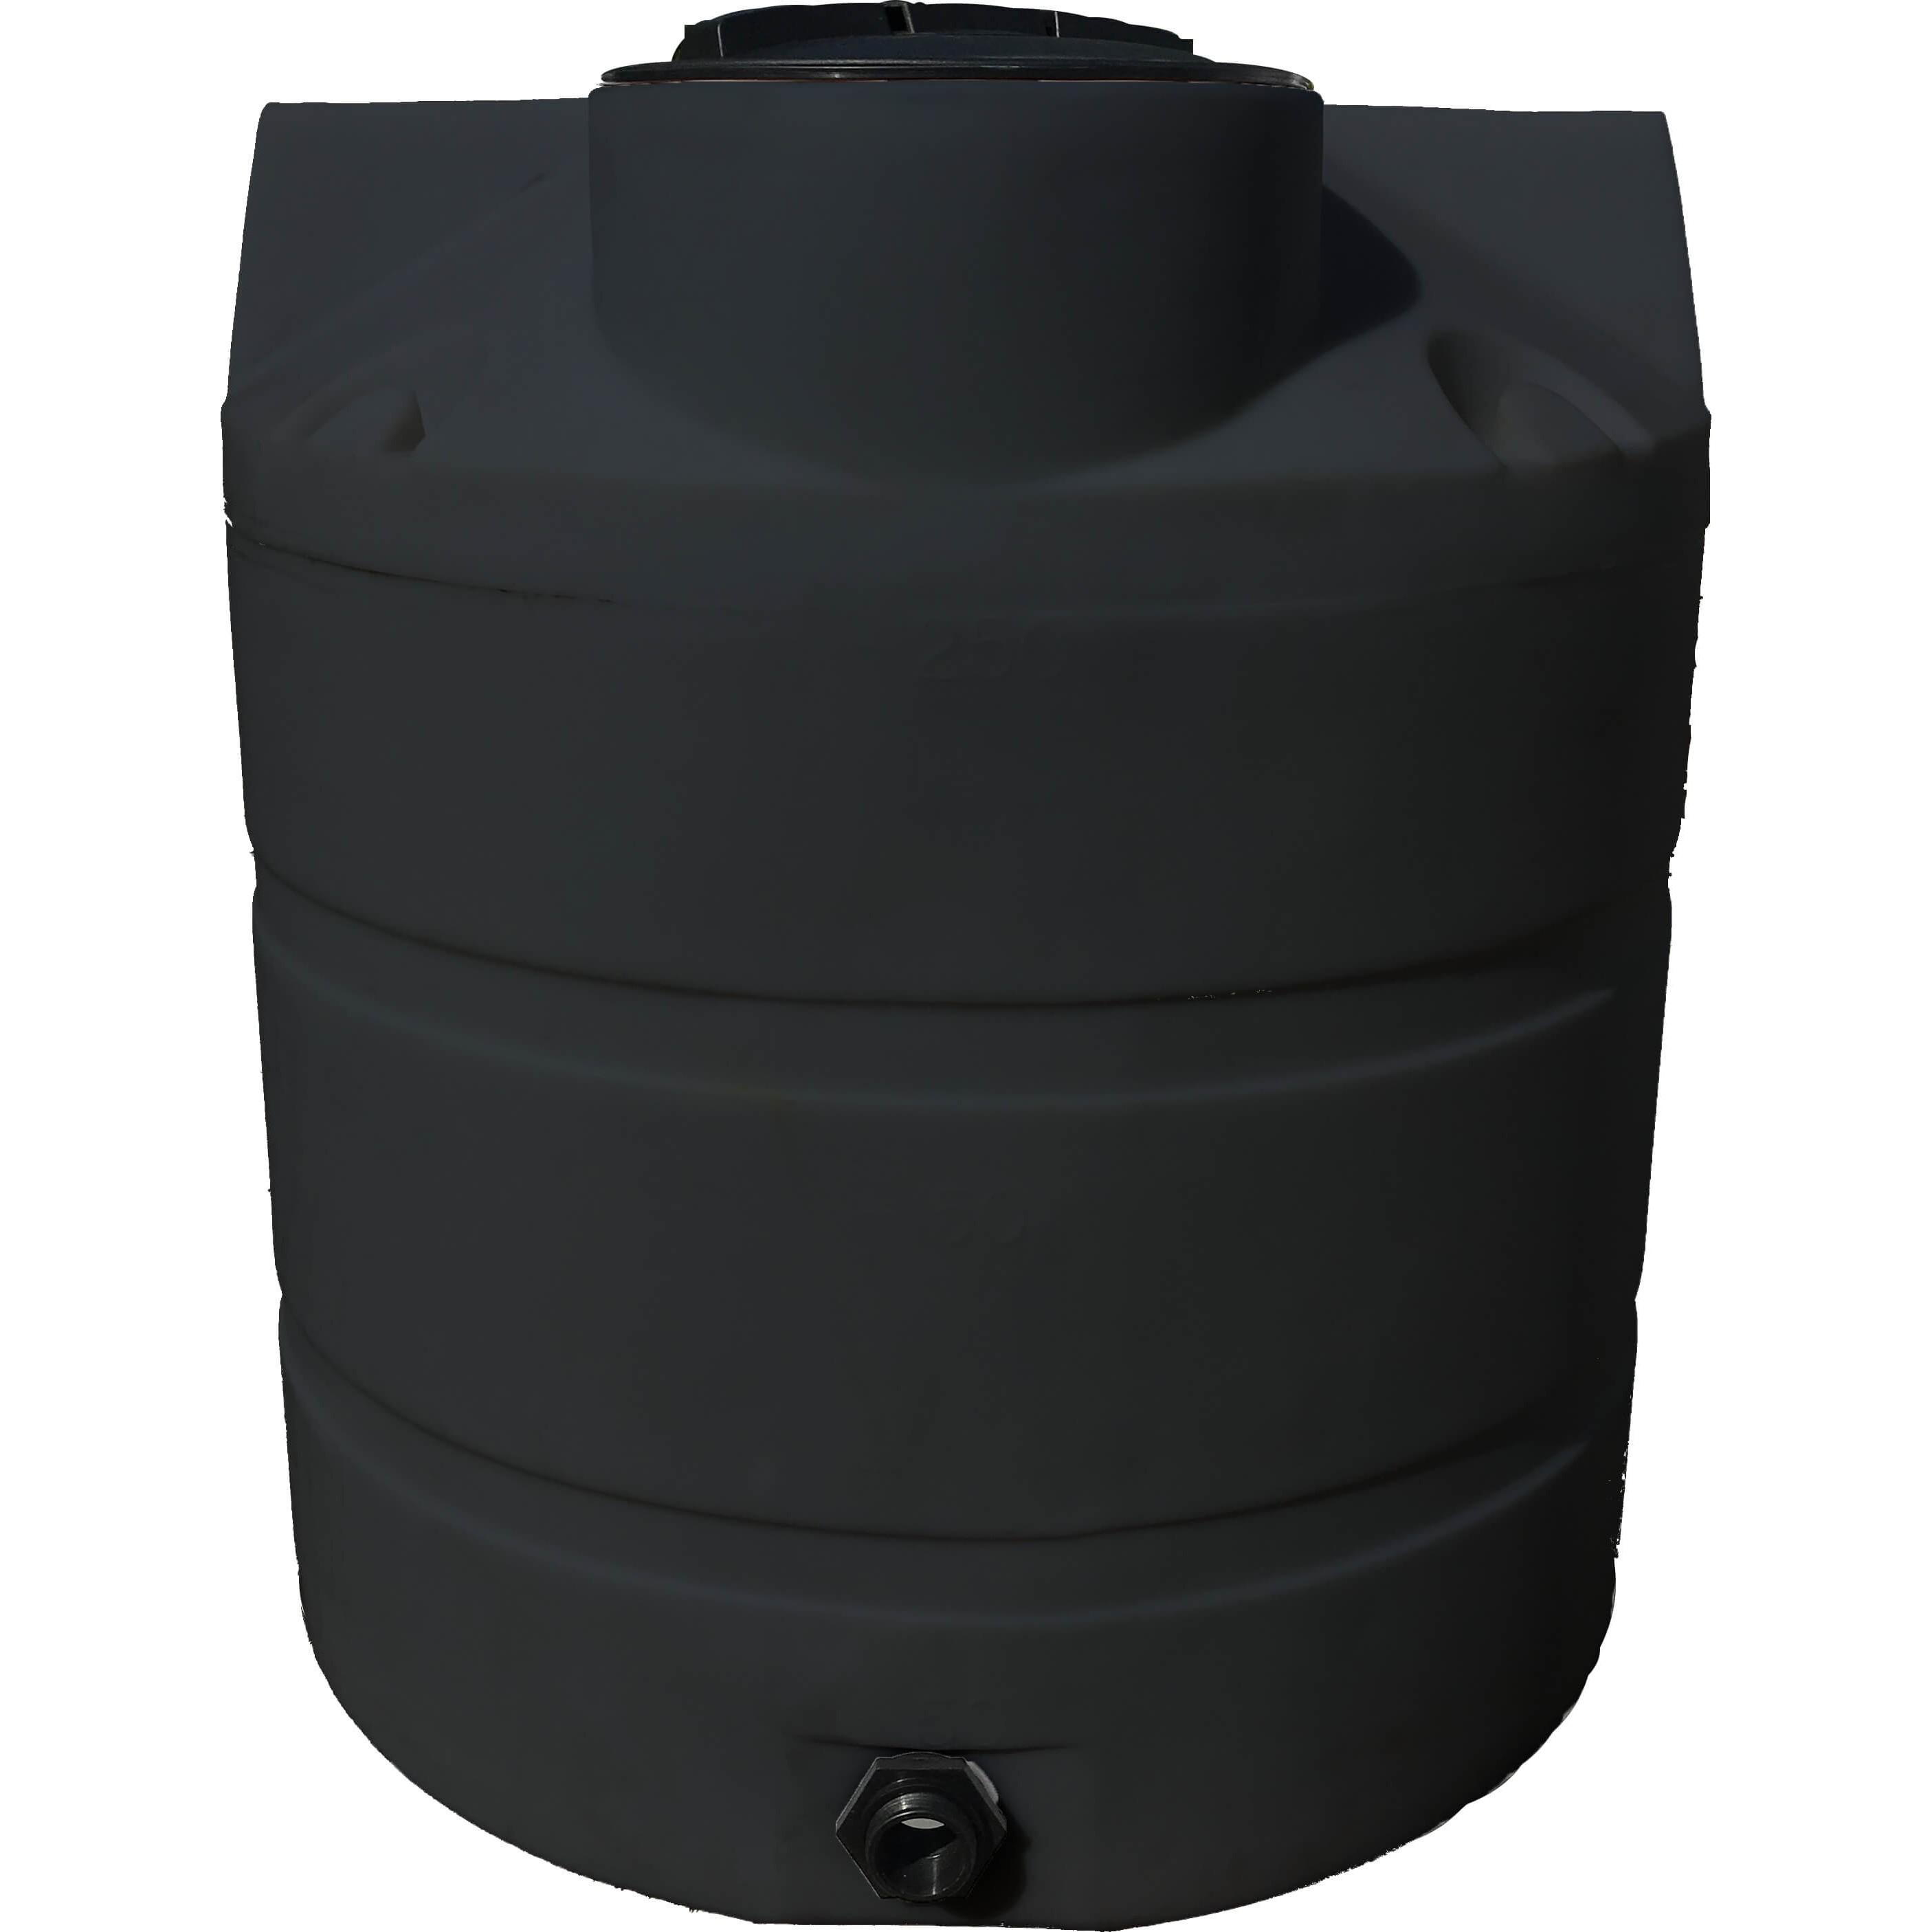 650 Gallon Water Storage Tank Black Dura Cast 900650b